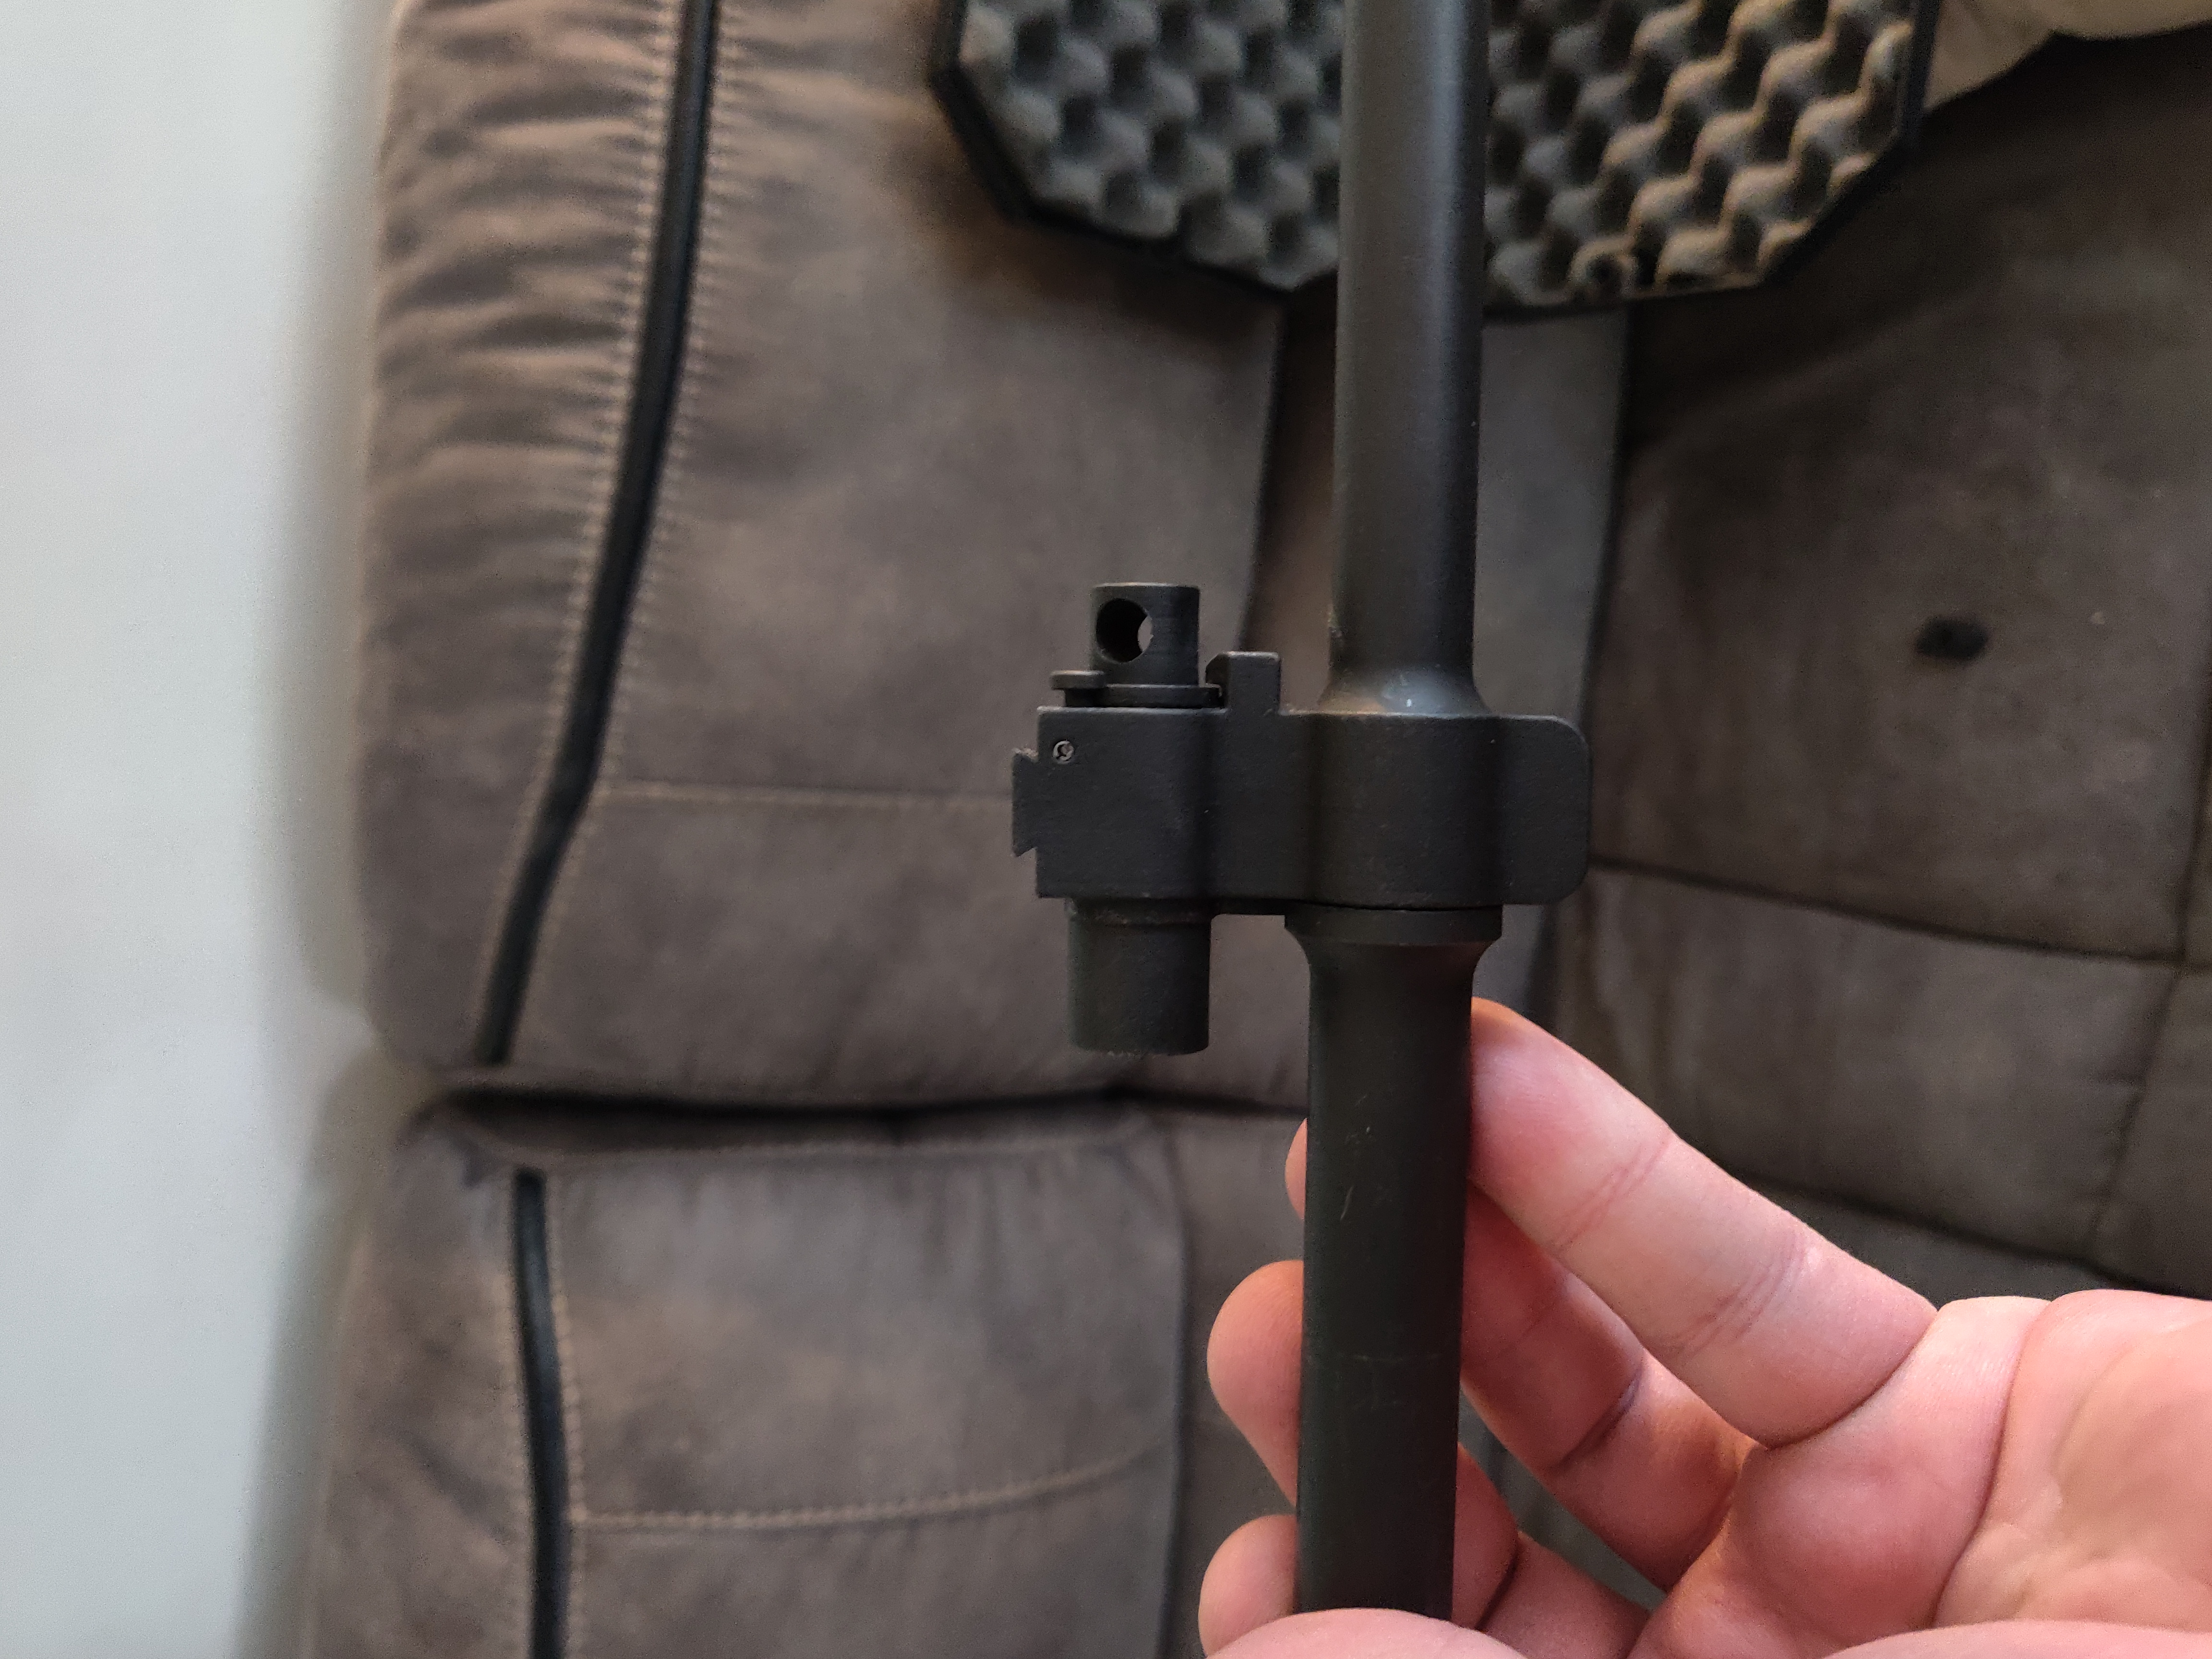 WTS 5.45x39 caliber conversion 0 shipped-img_20201102_152736.jpg